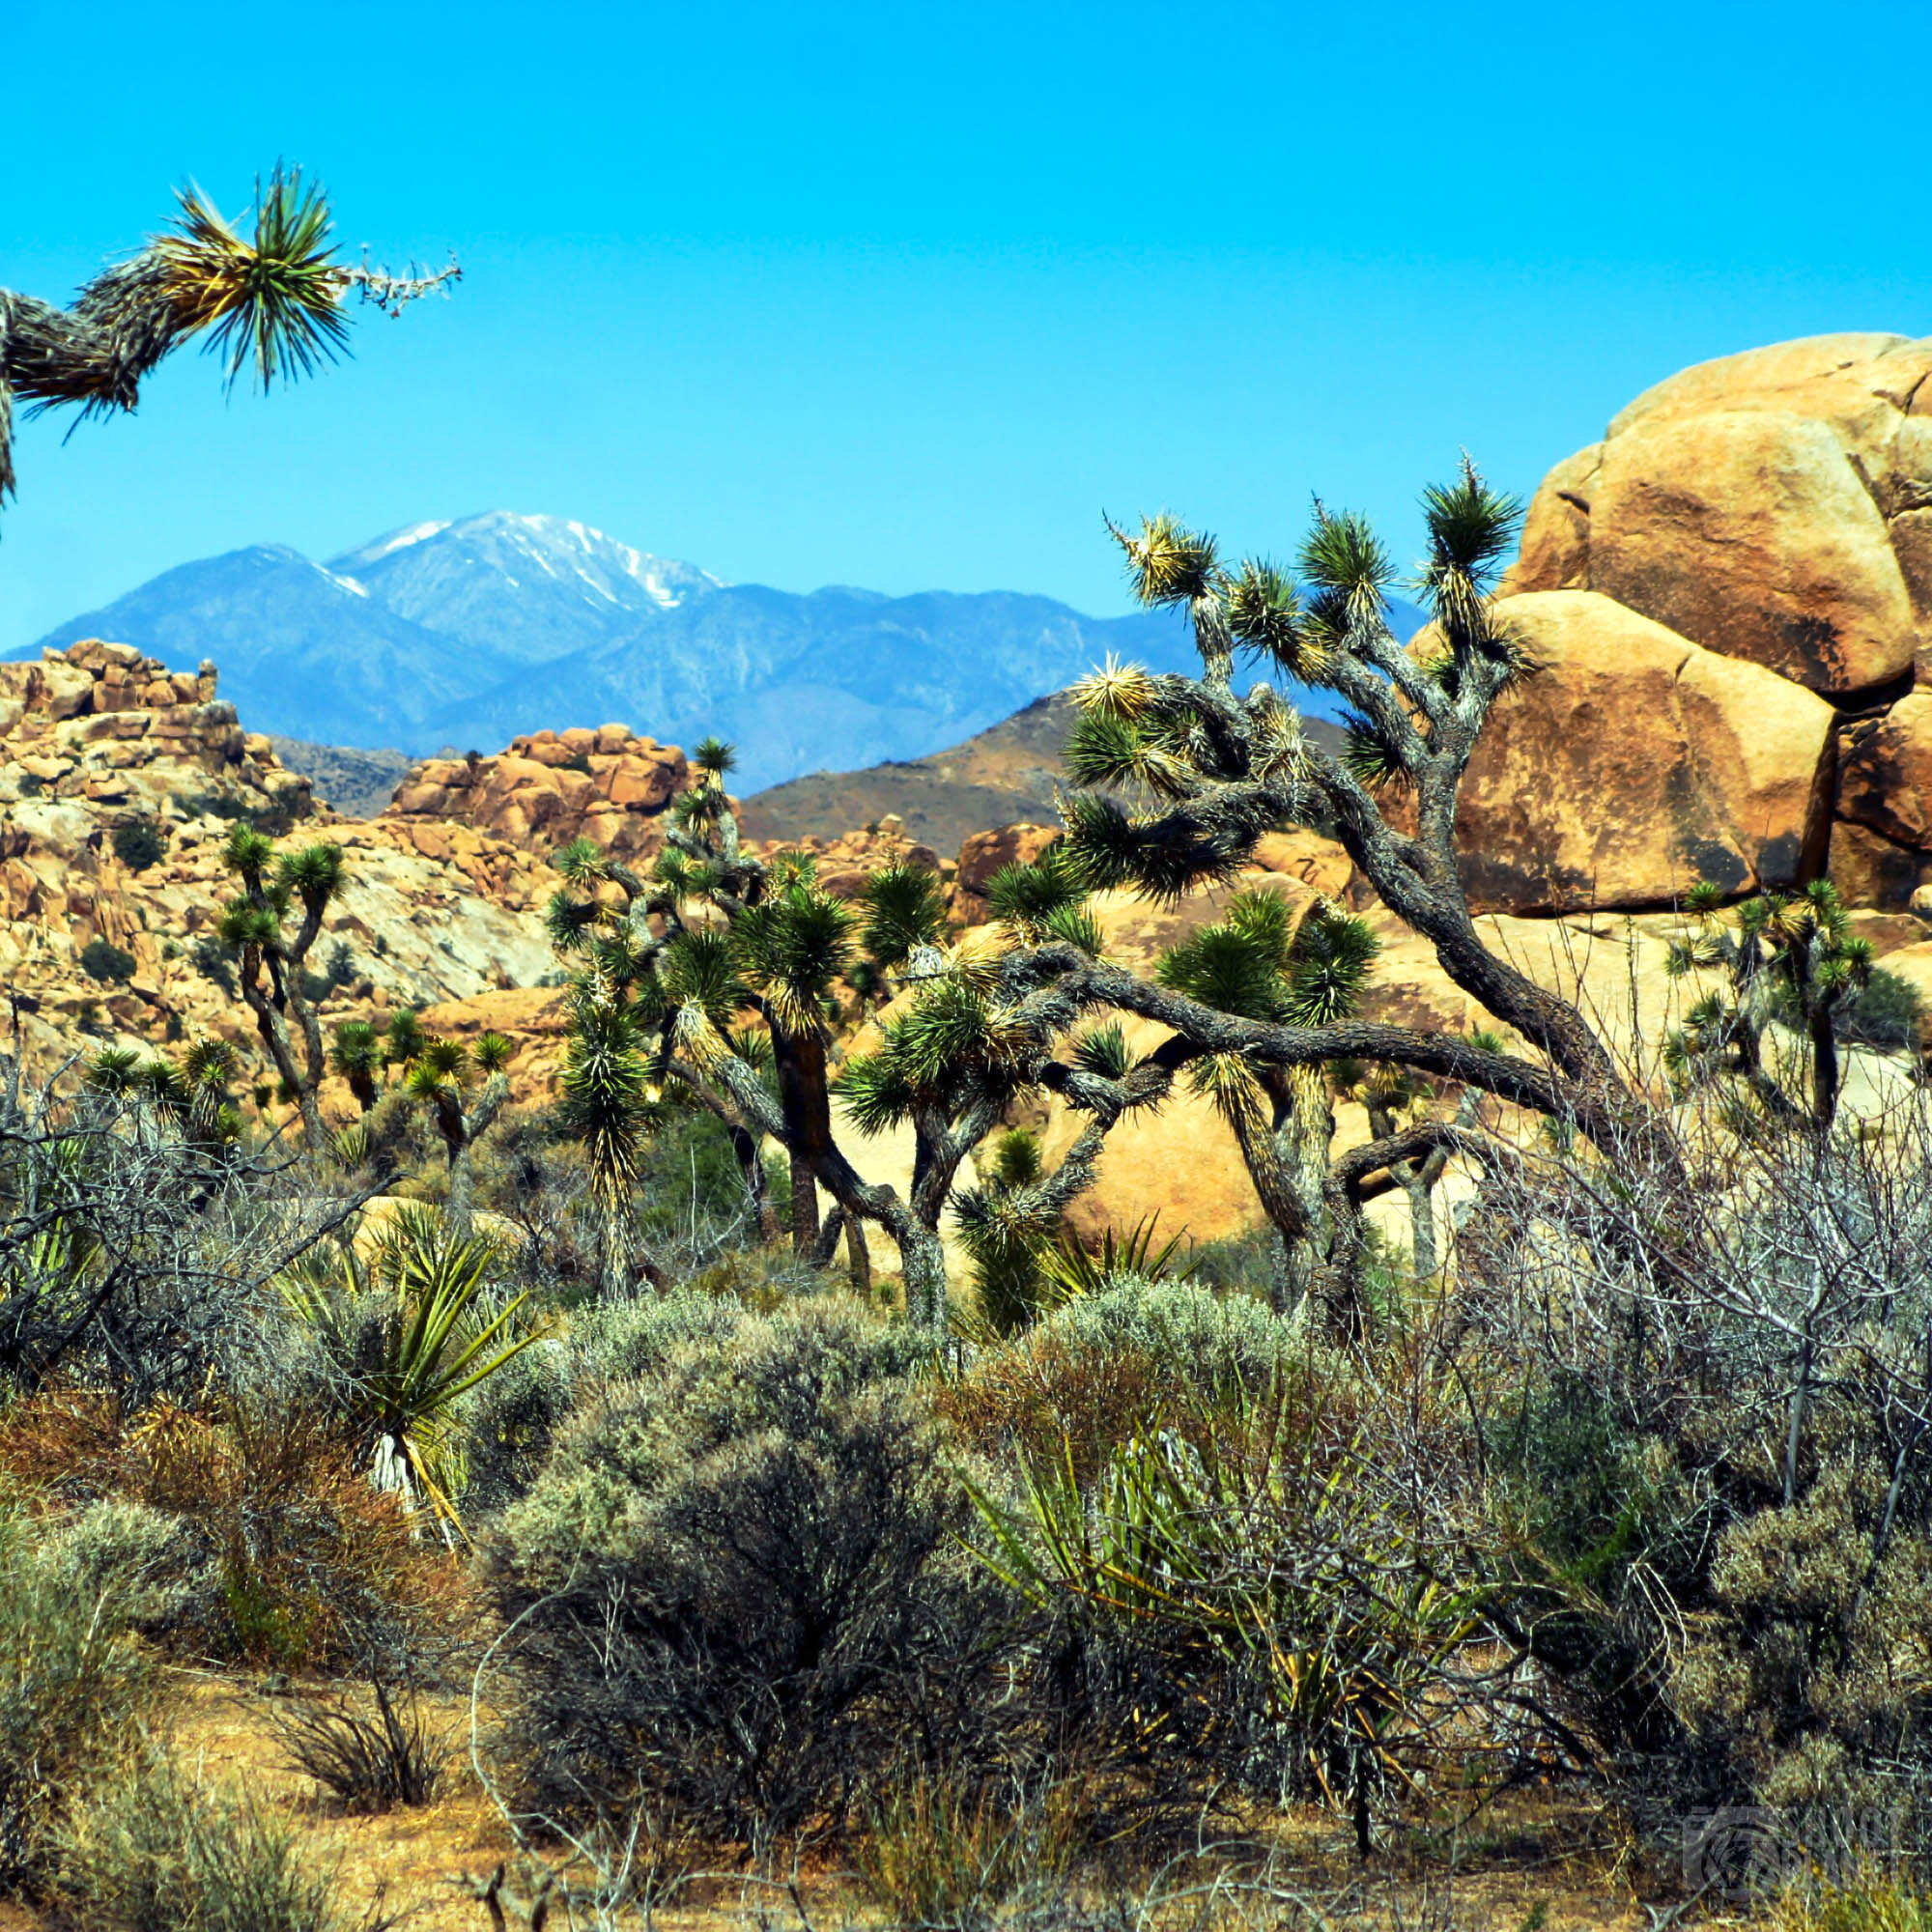 Boulders landscape in Joshua Tree Park, California